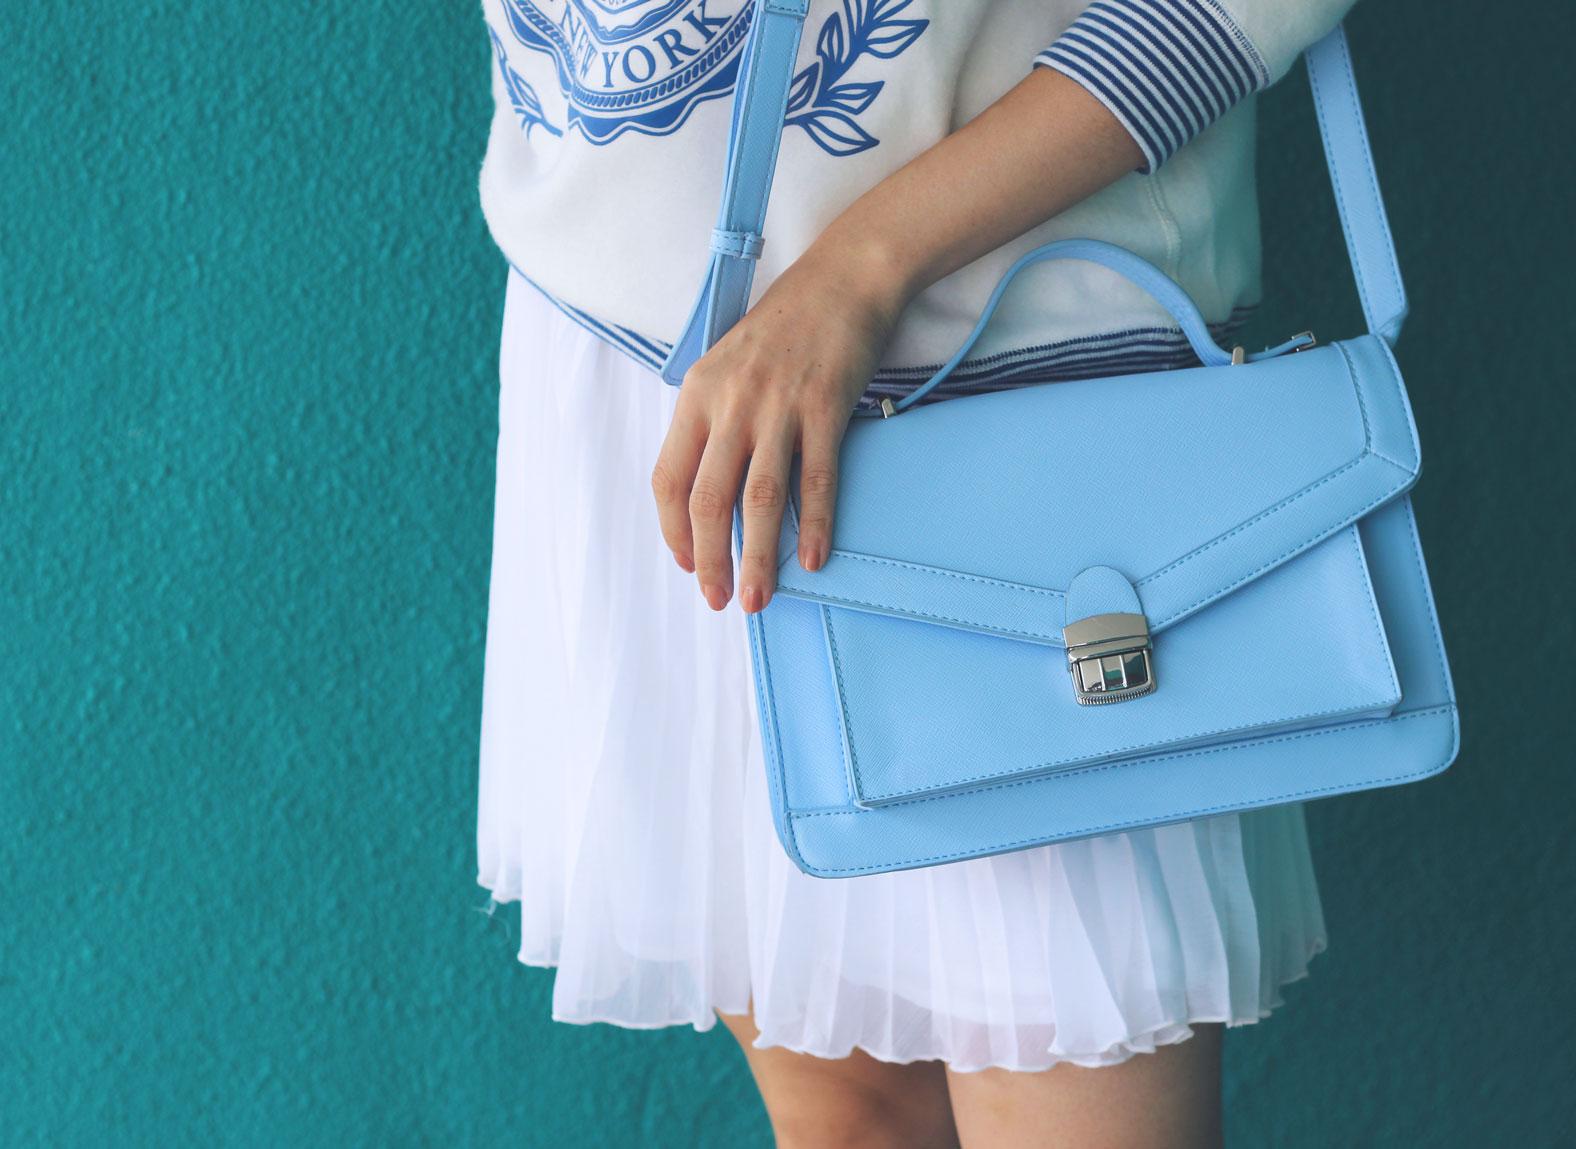 Light blue satchel